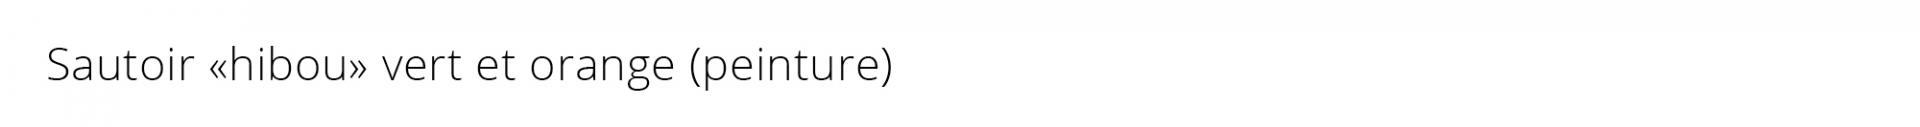 Titre sautoir hibou vert orange